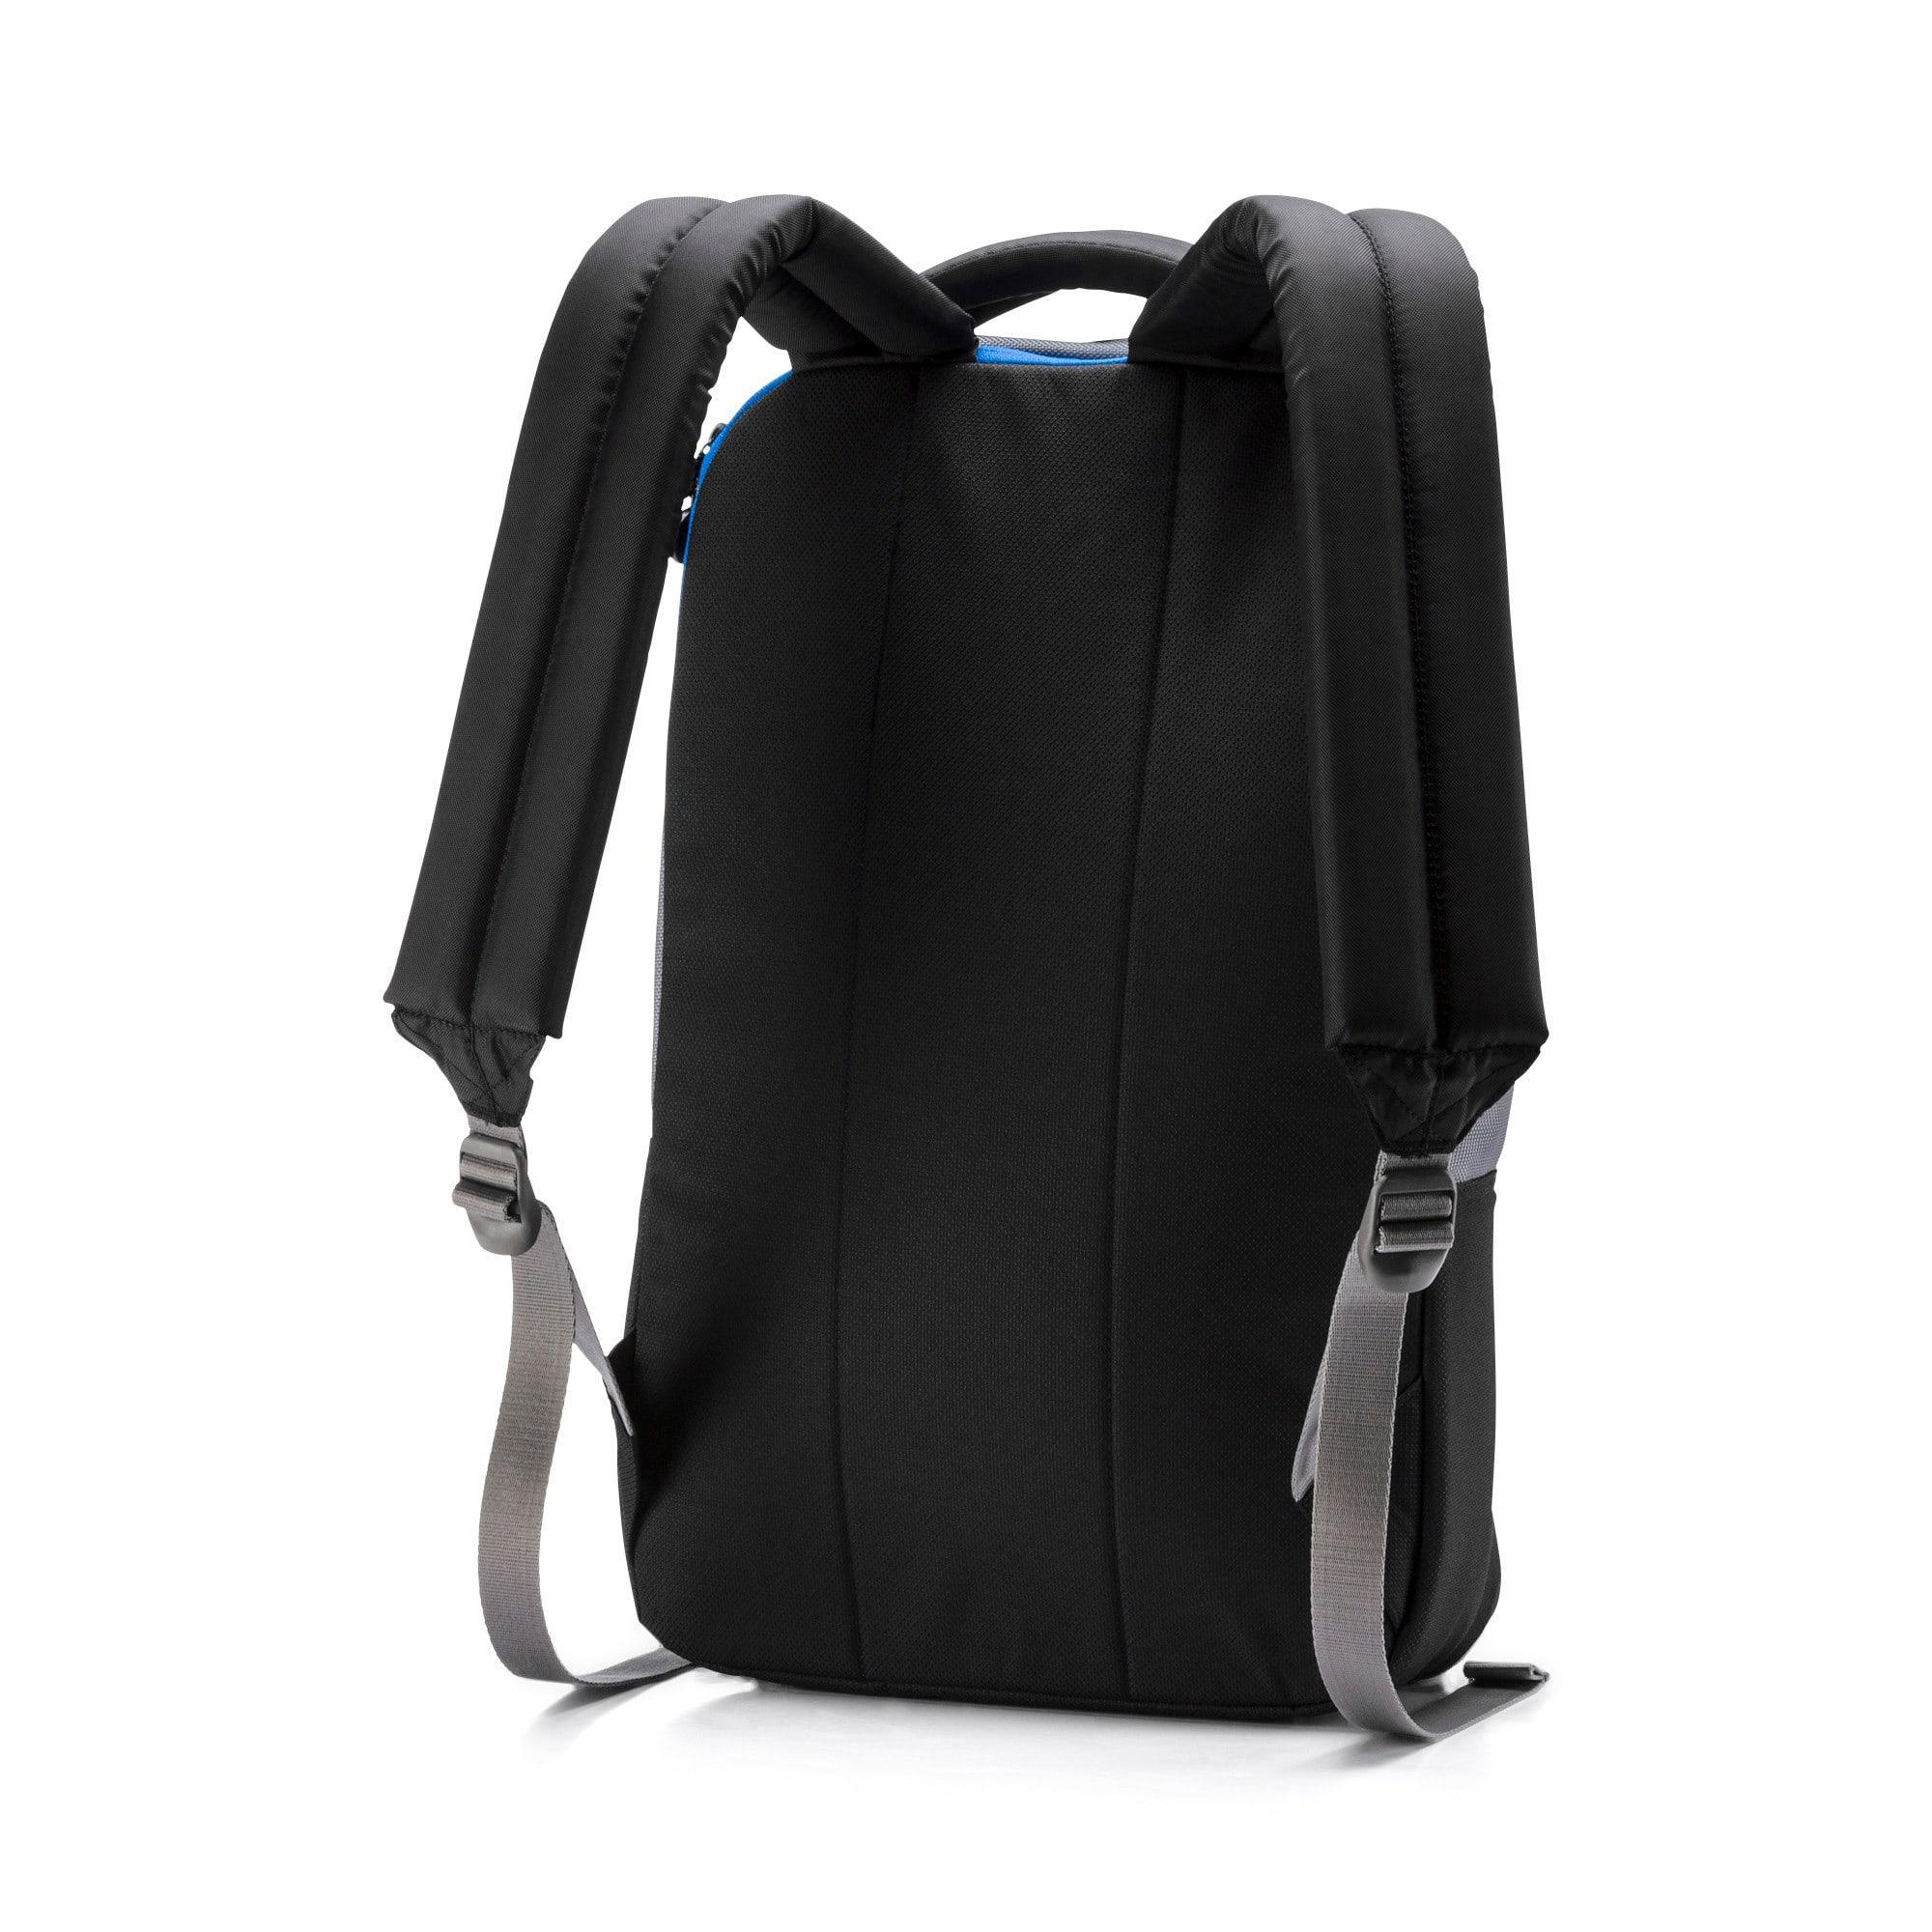 Thumbnail 2 of RS-X Backpack, Charcoal Gray, medium